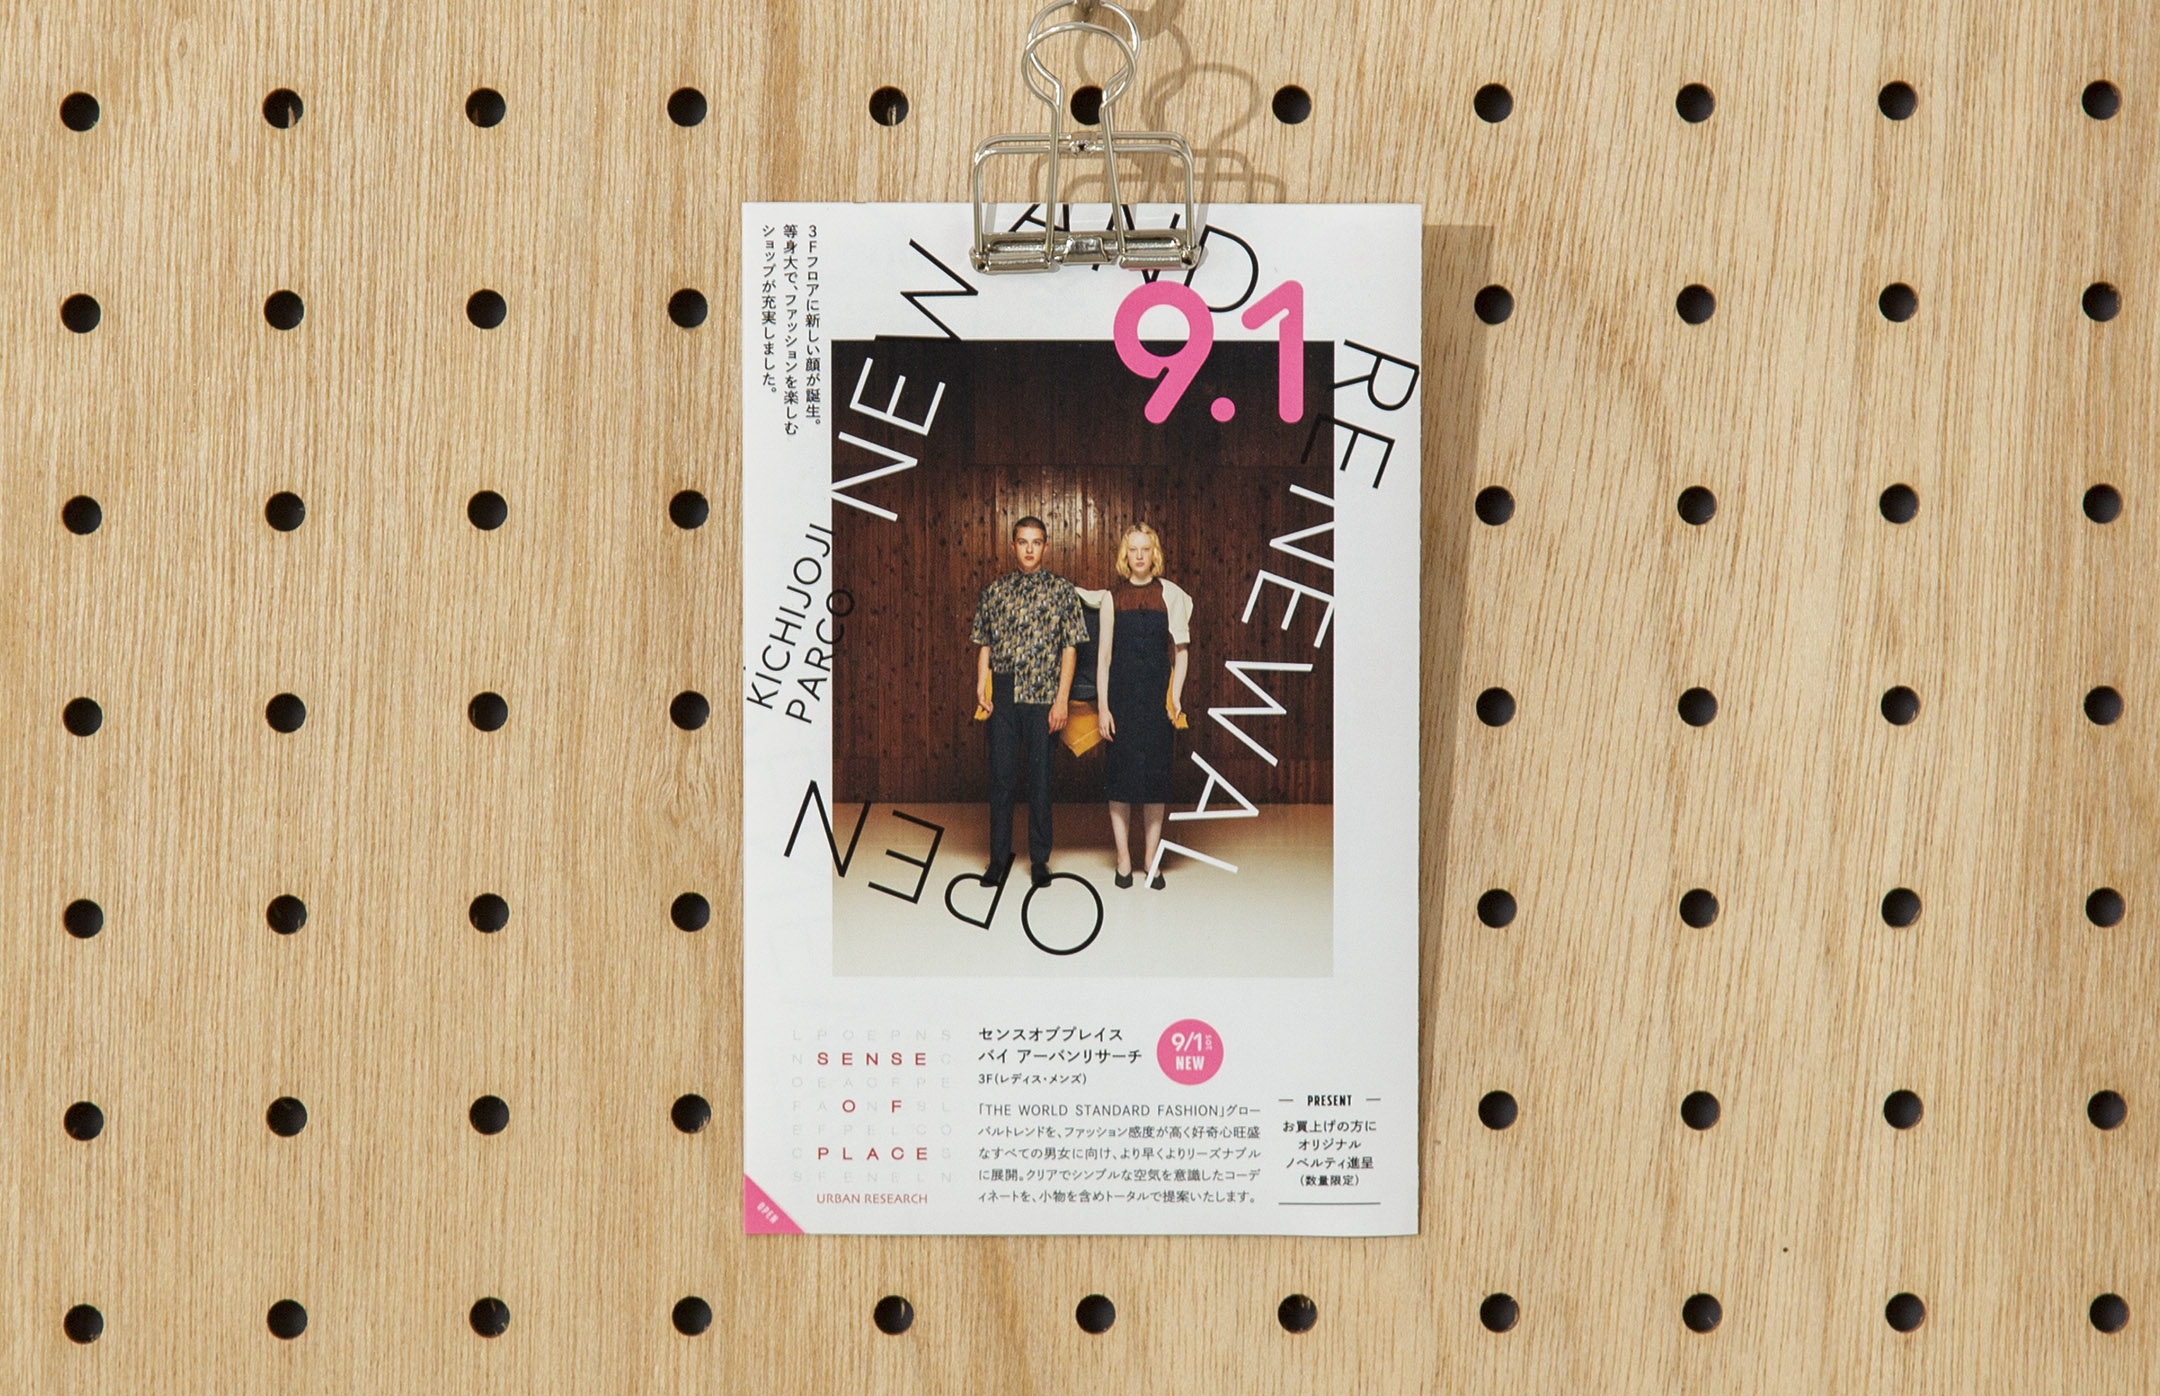 KICHIJOJI PARCO NEW AND RENEWAL OPEN 9.1